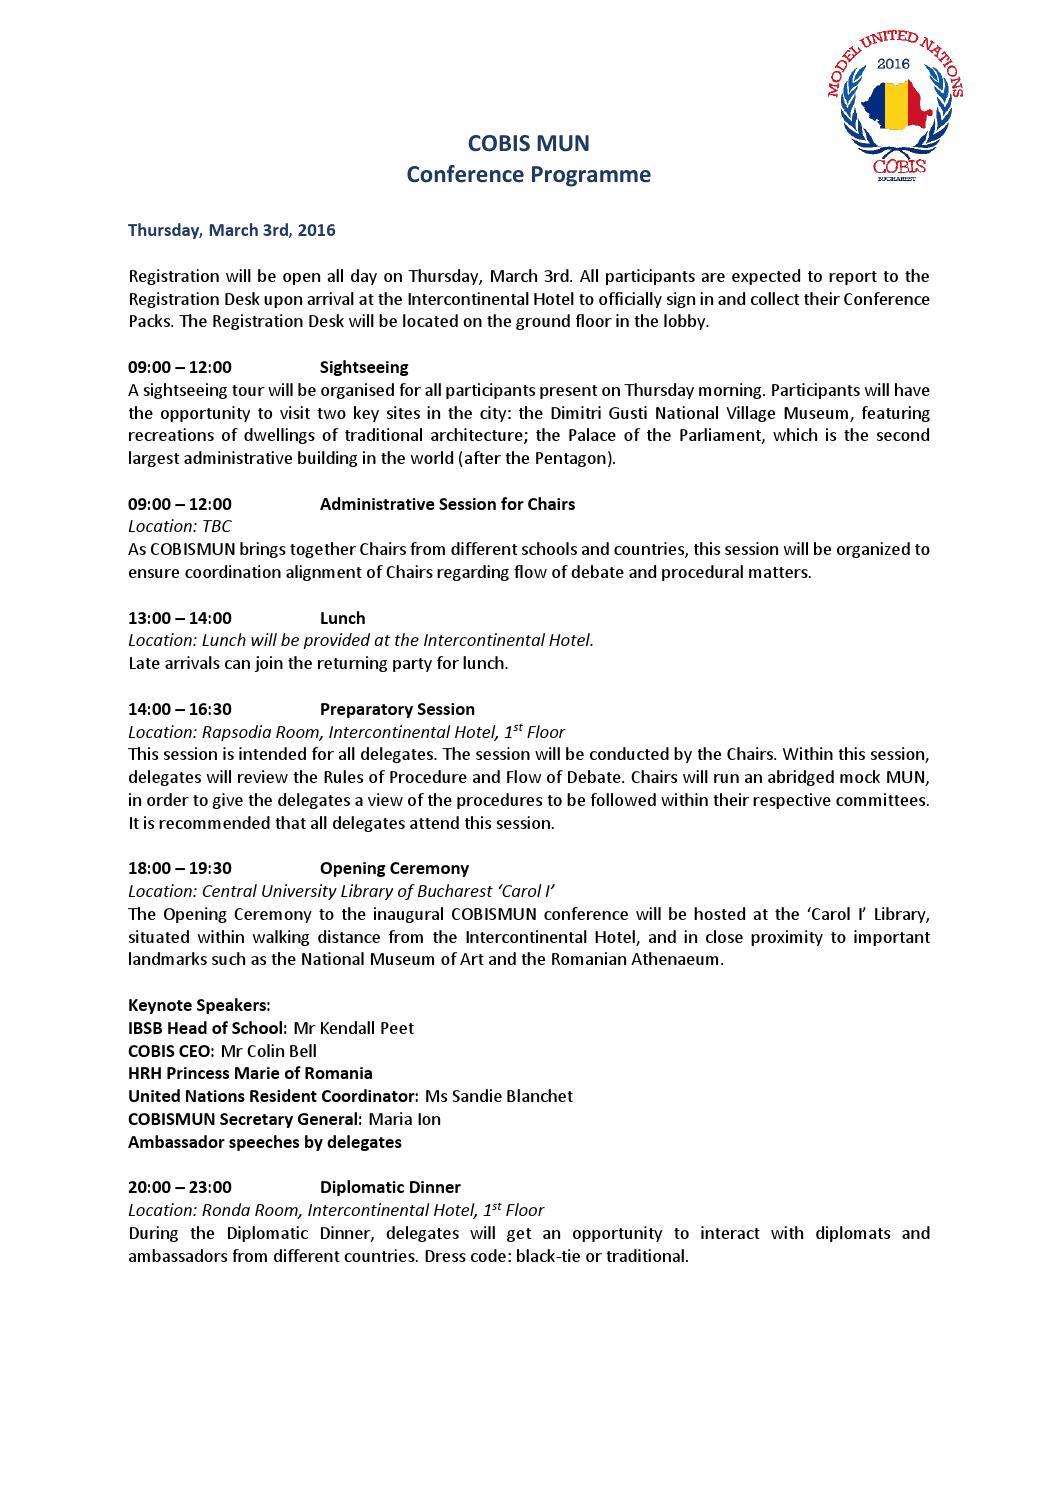 COBIS MUN Conference Programme by International British